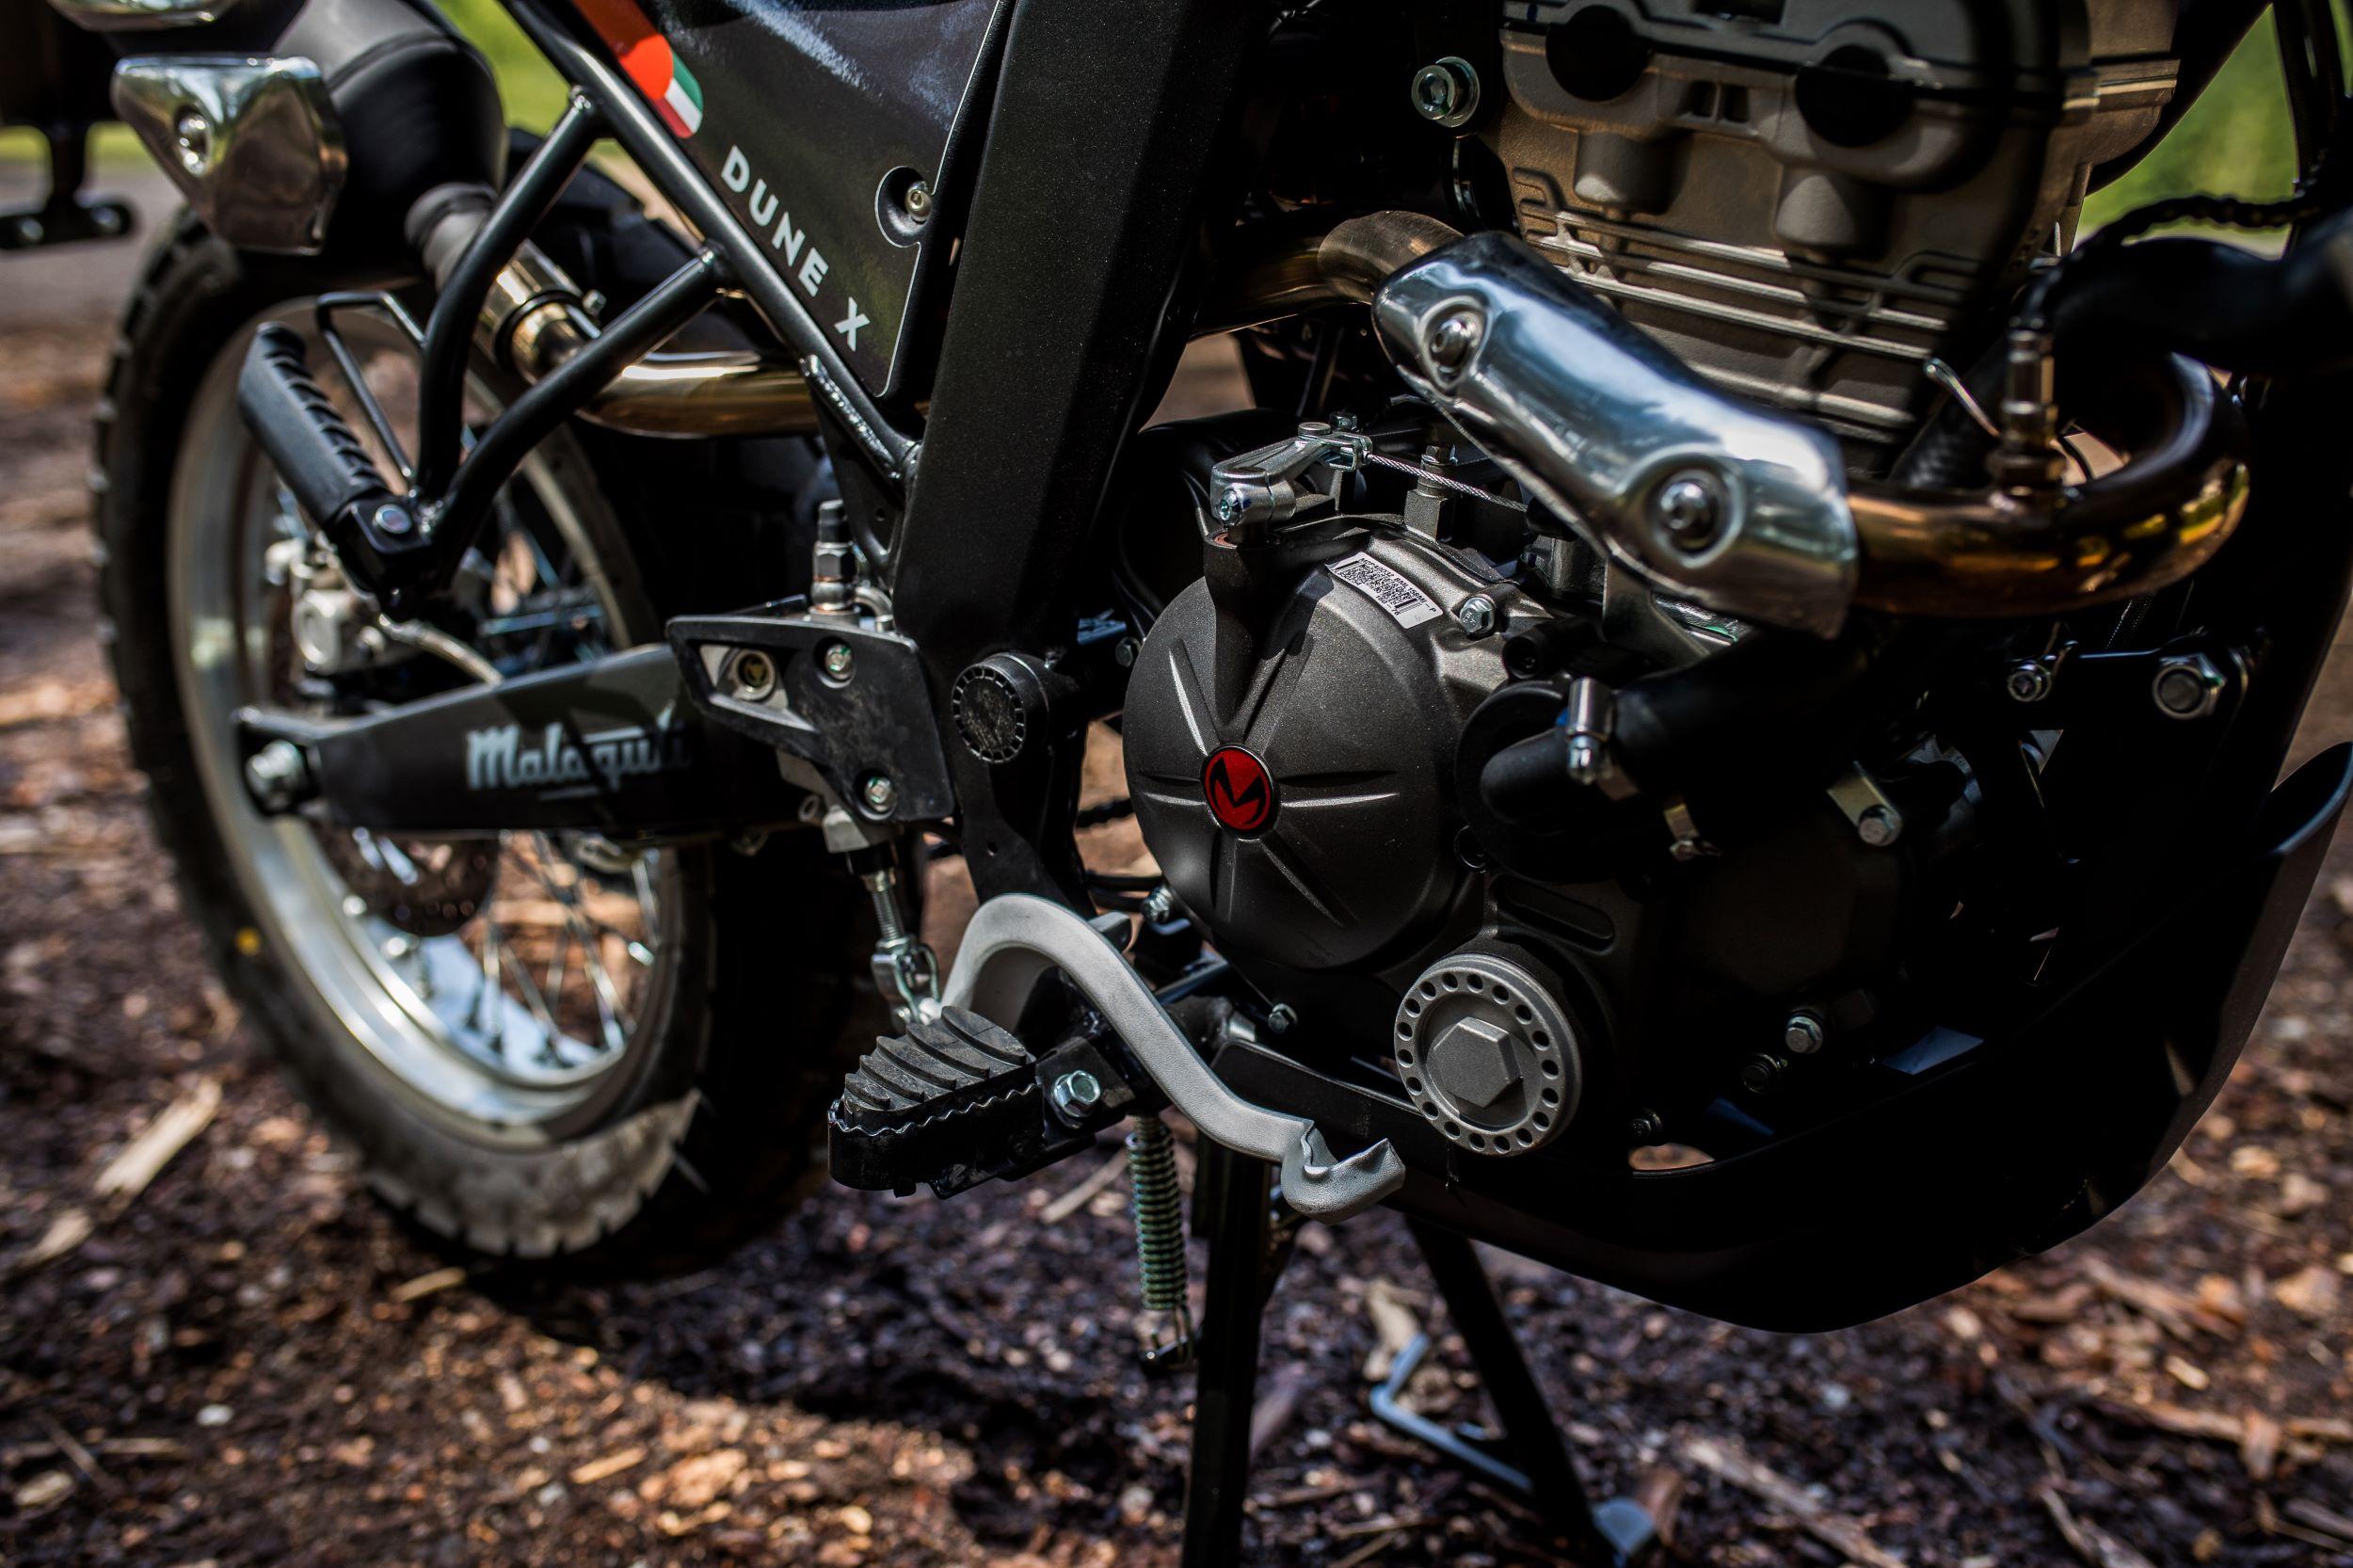 https://malaguti.bike/wp-content/uploads/sites/3/2021/08/dune-x-right-side.jpg